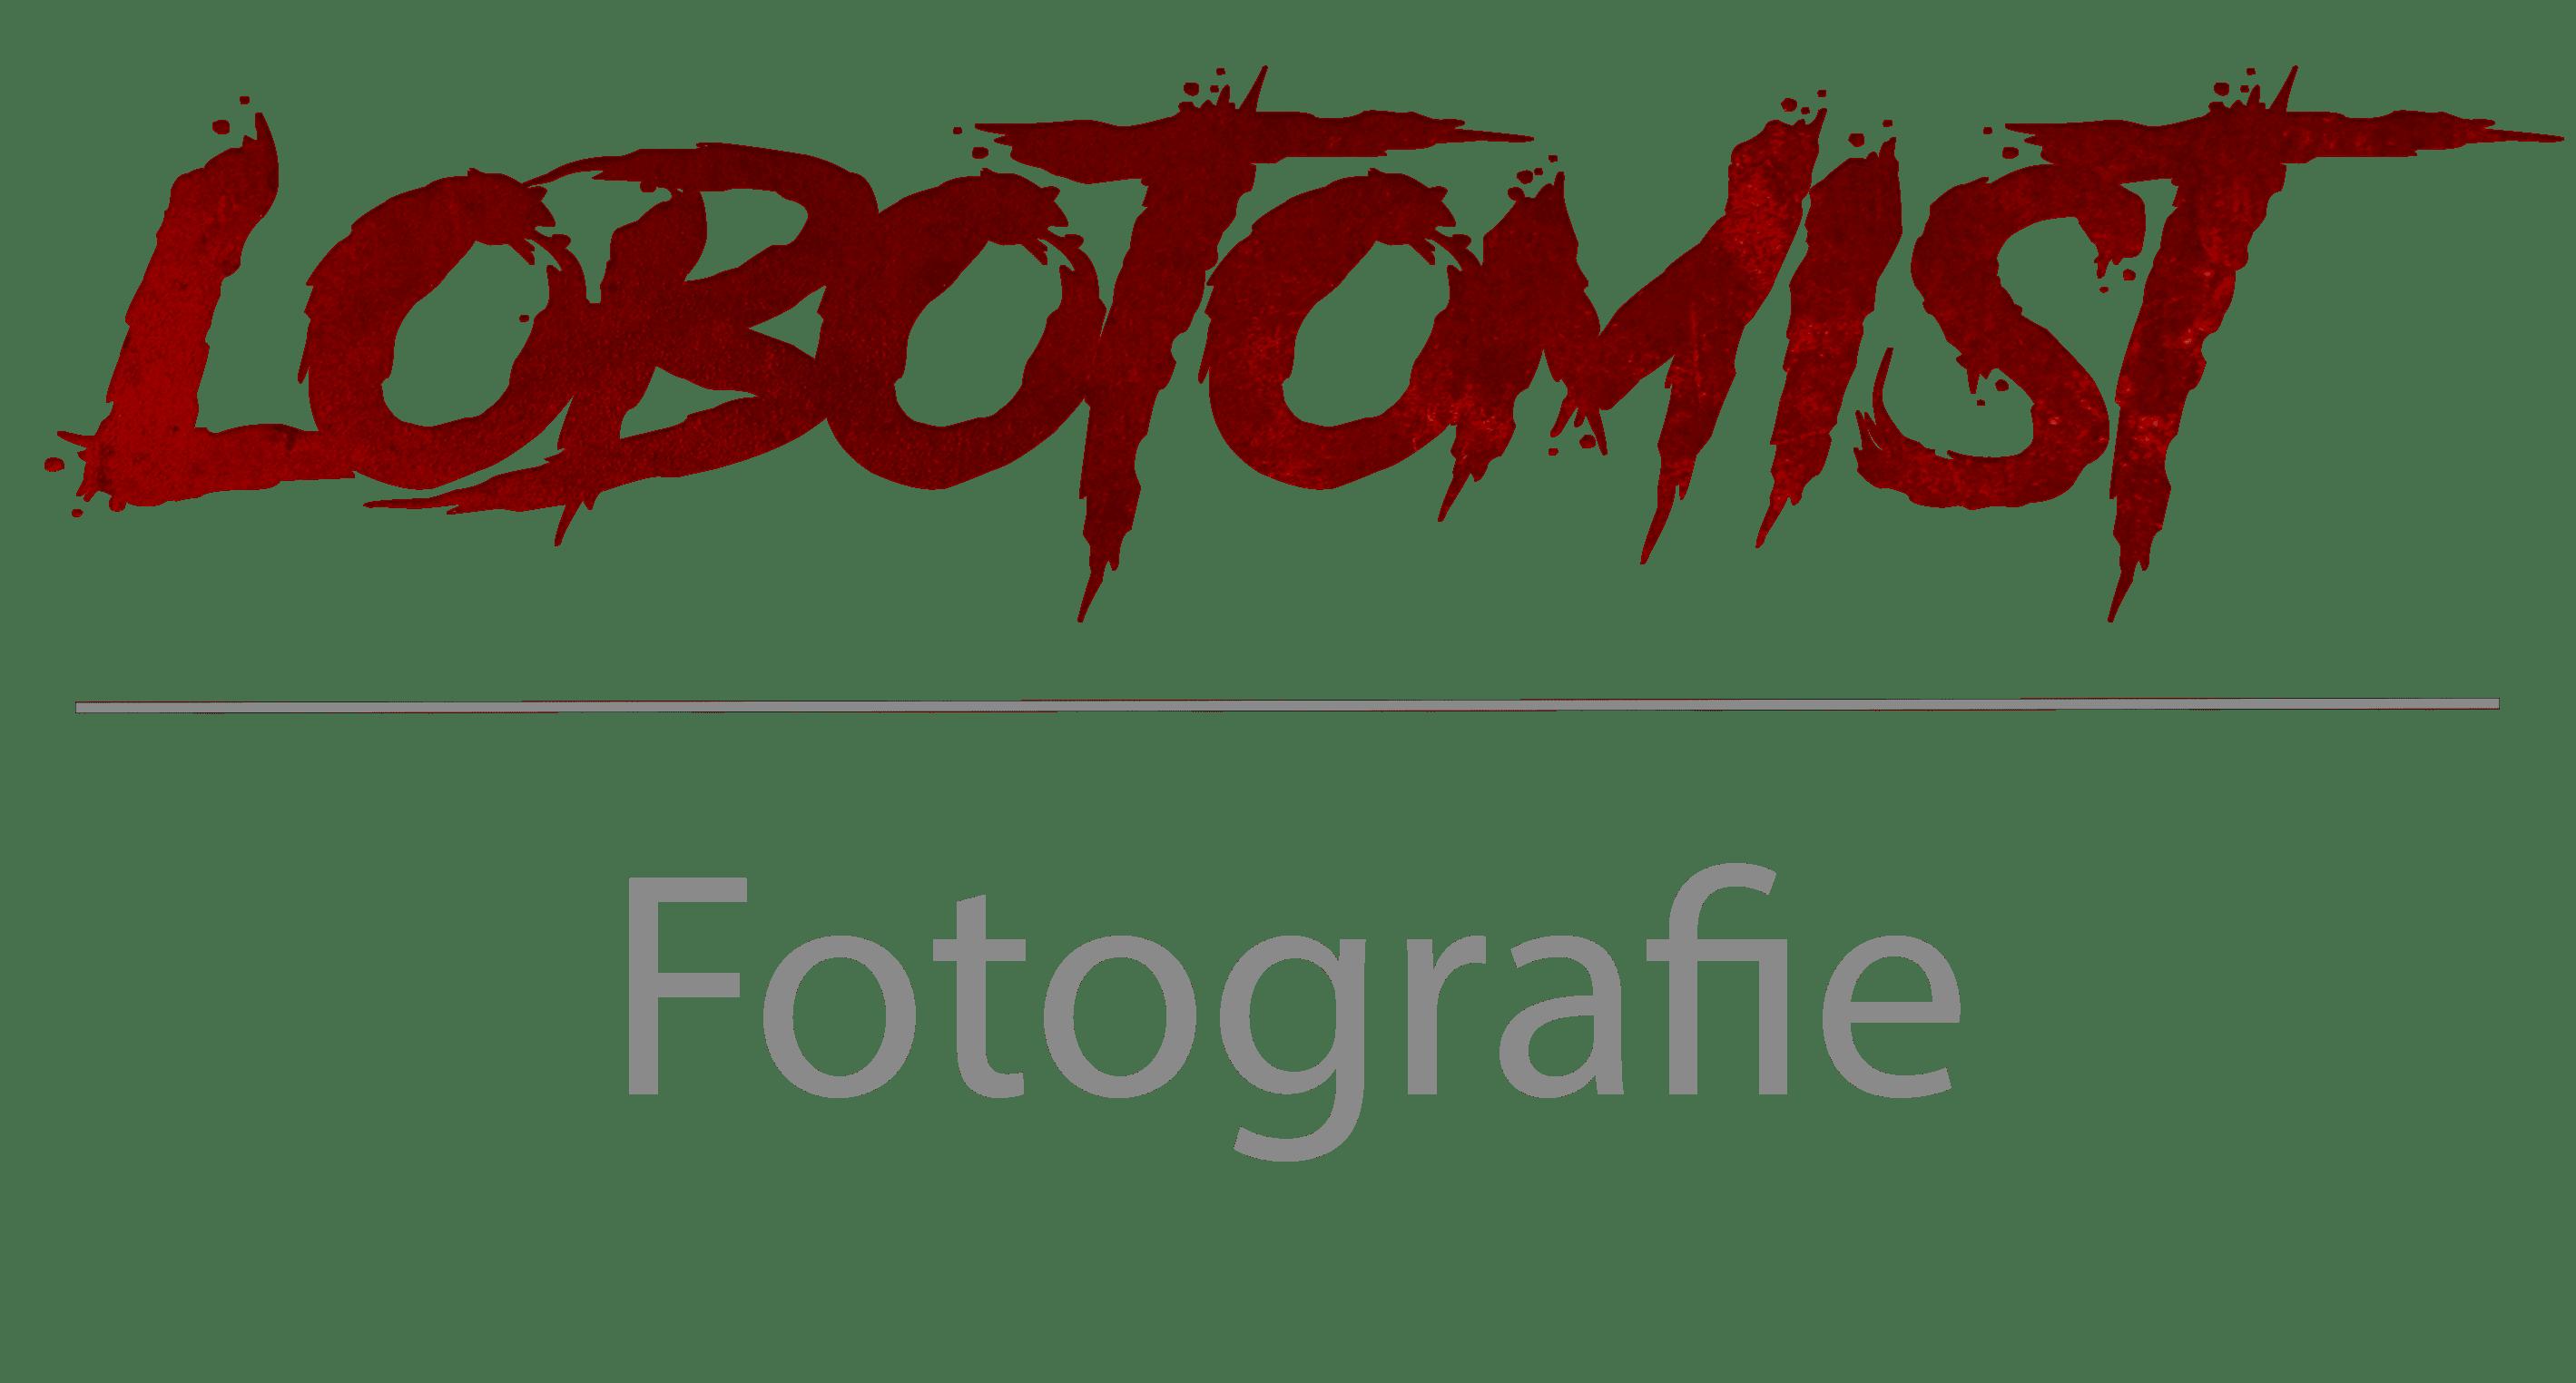 lobotomist-logo-website